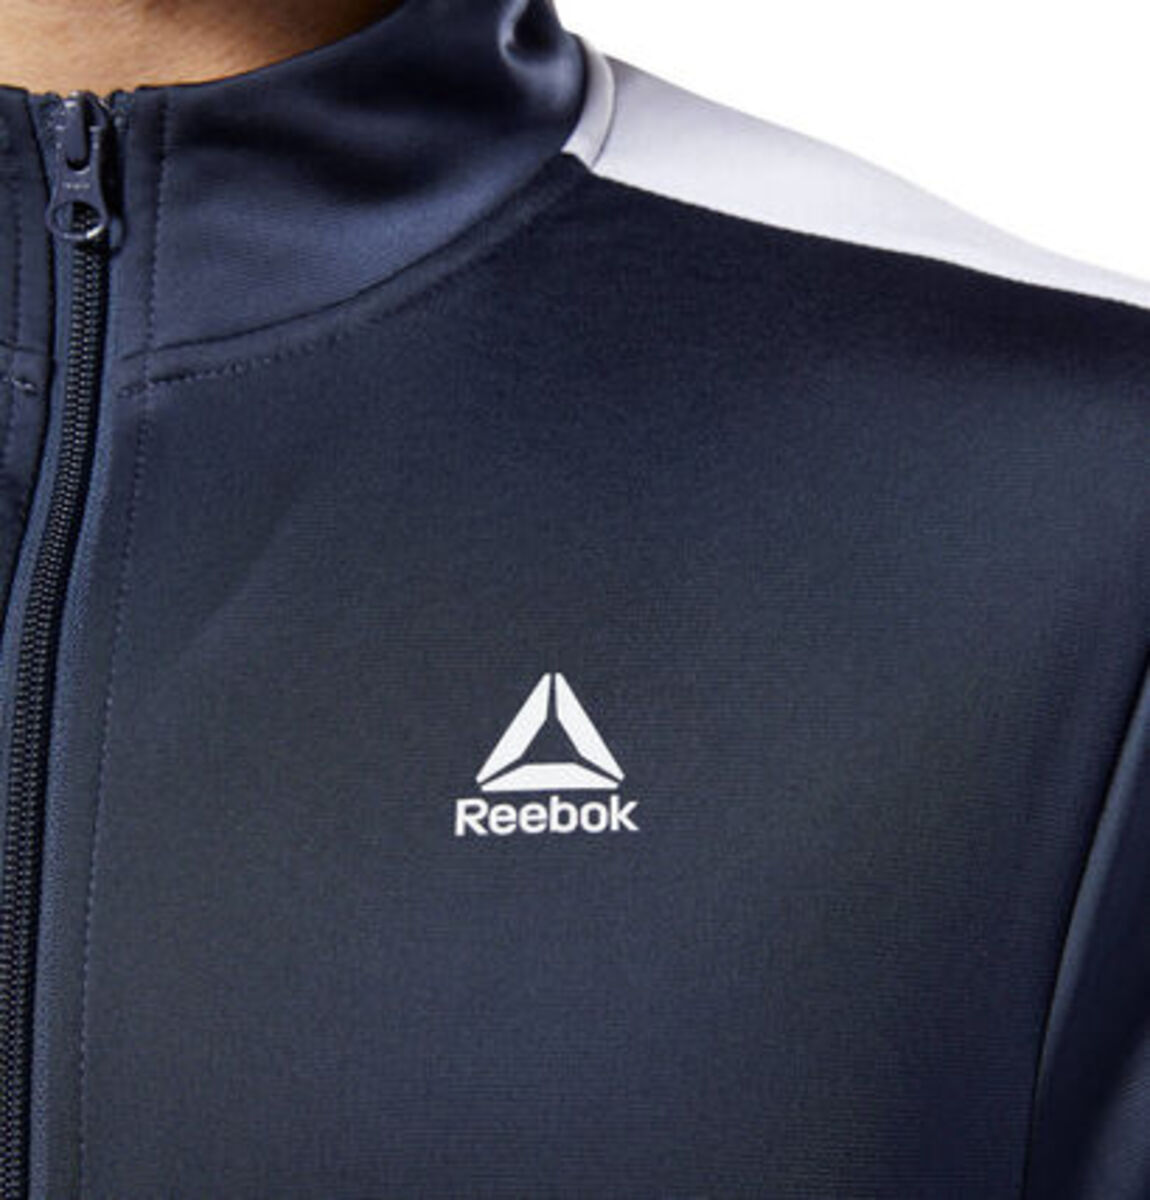 Bild 3 von Reebok Herren Trainingsjacke Linear Logo